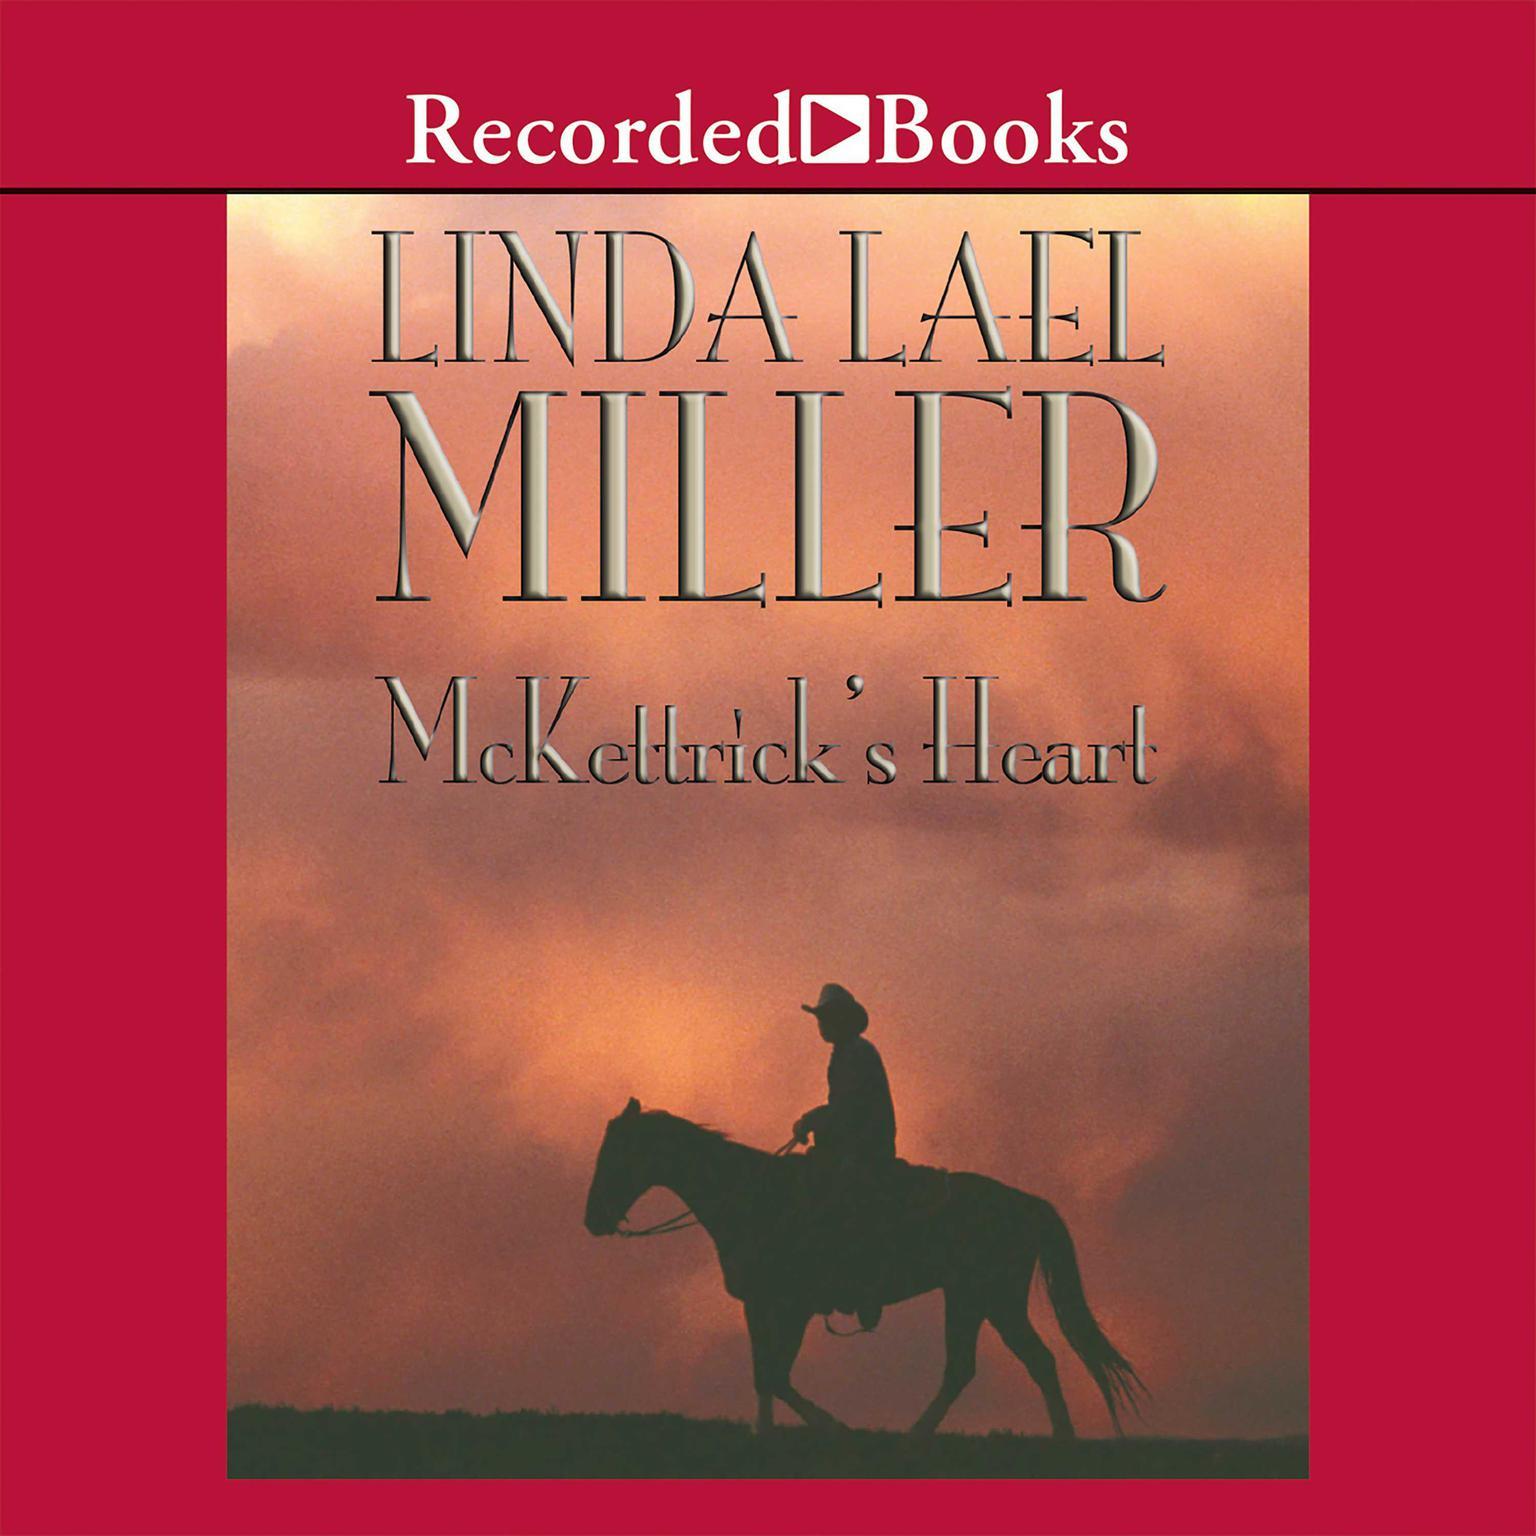 Printable McKettrick's Heart Audiobook Cover Art